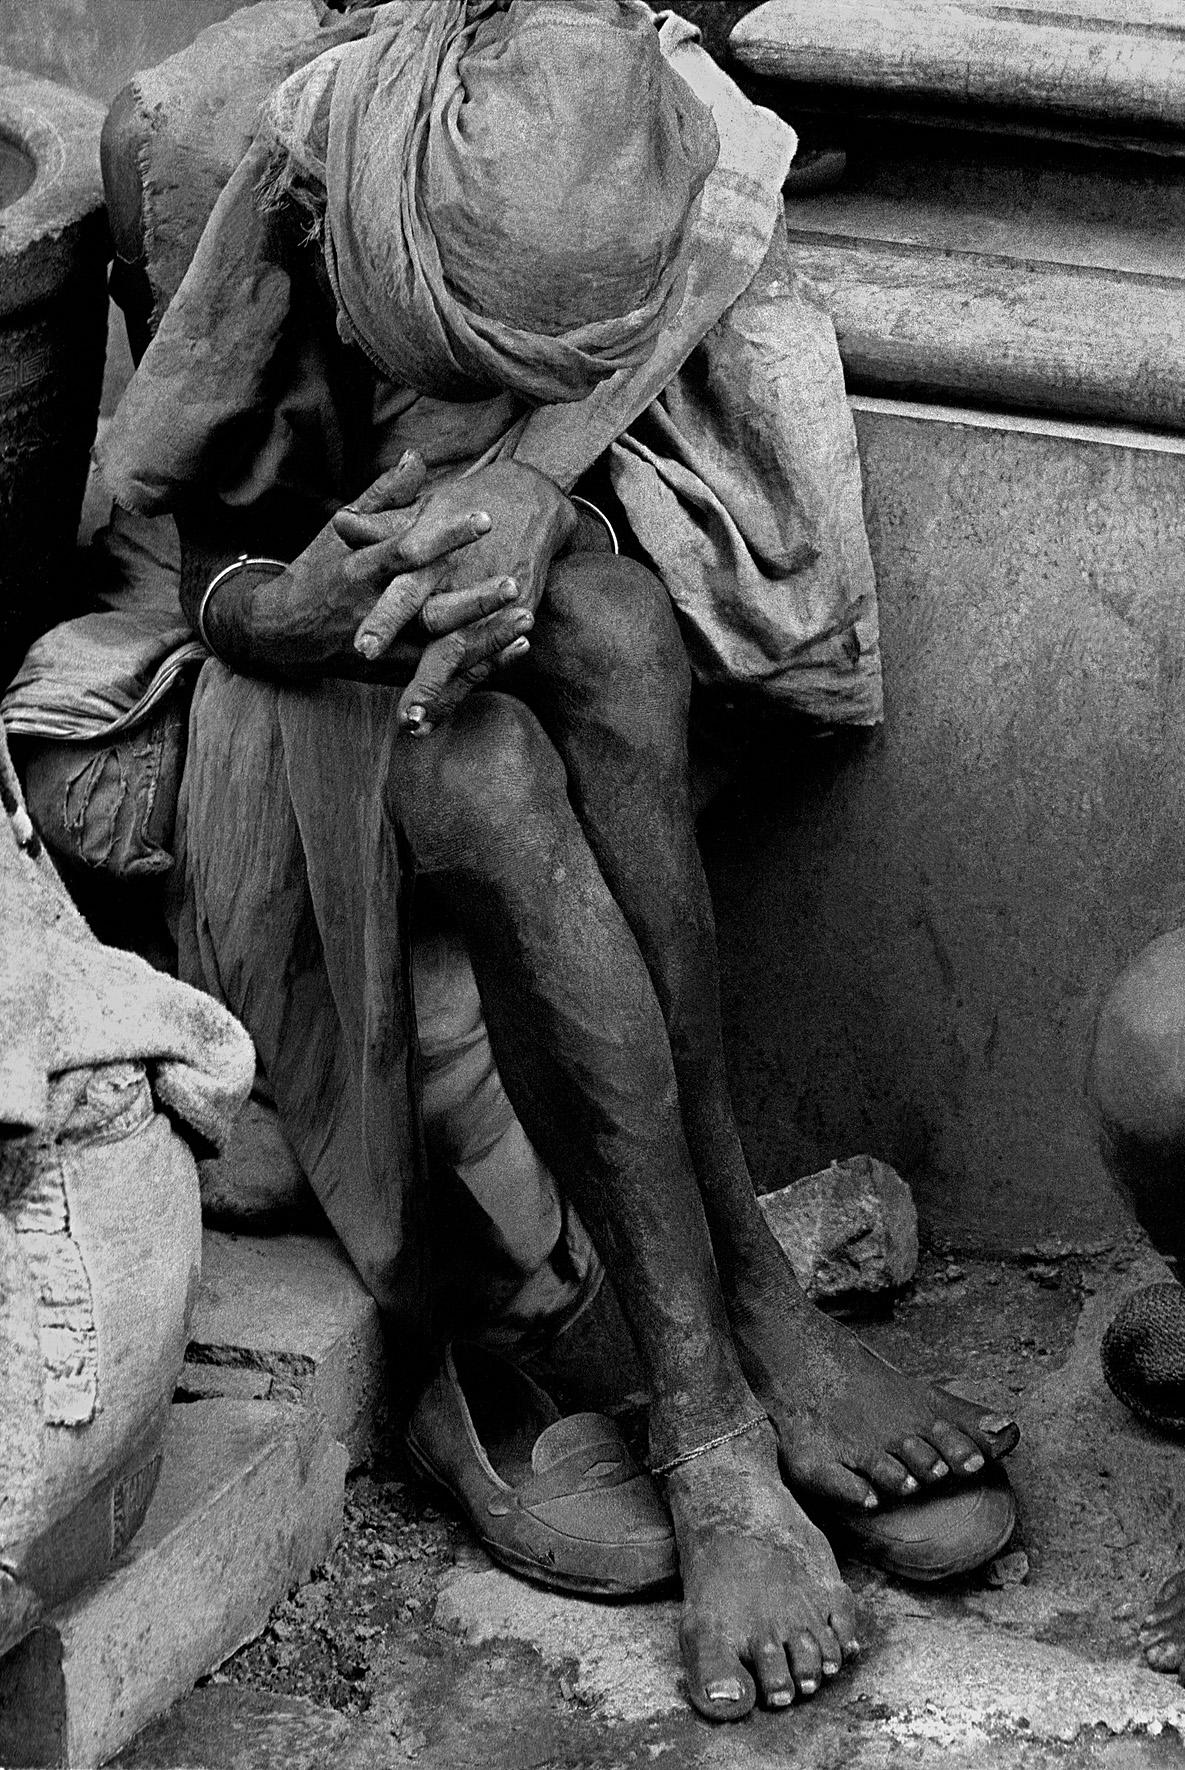 © Frank Horvat – Beggar (a) Calcutta, India, 1962, Courtesy KLV Art Projects